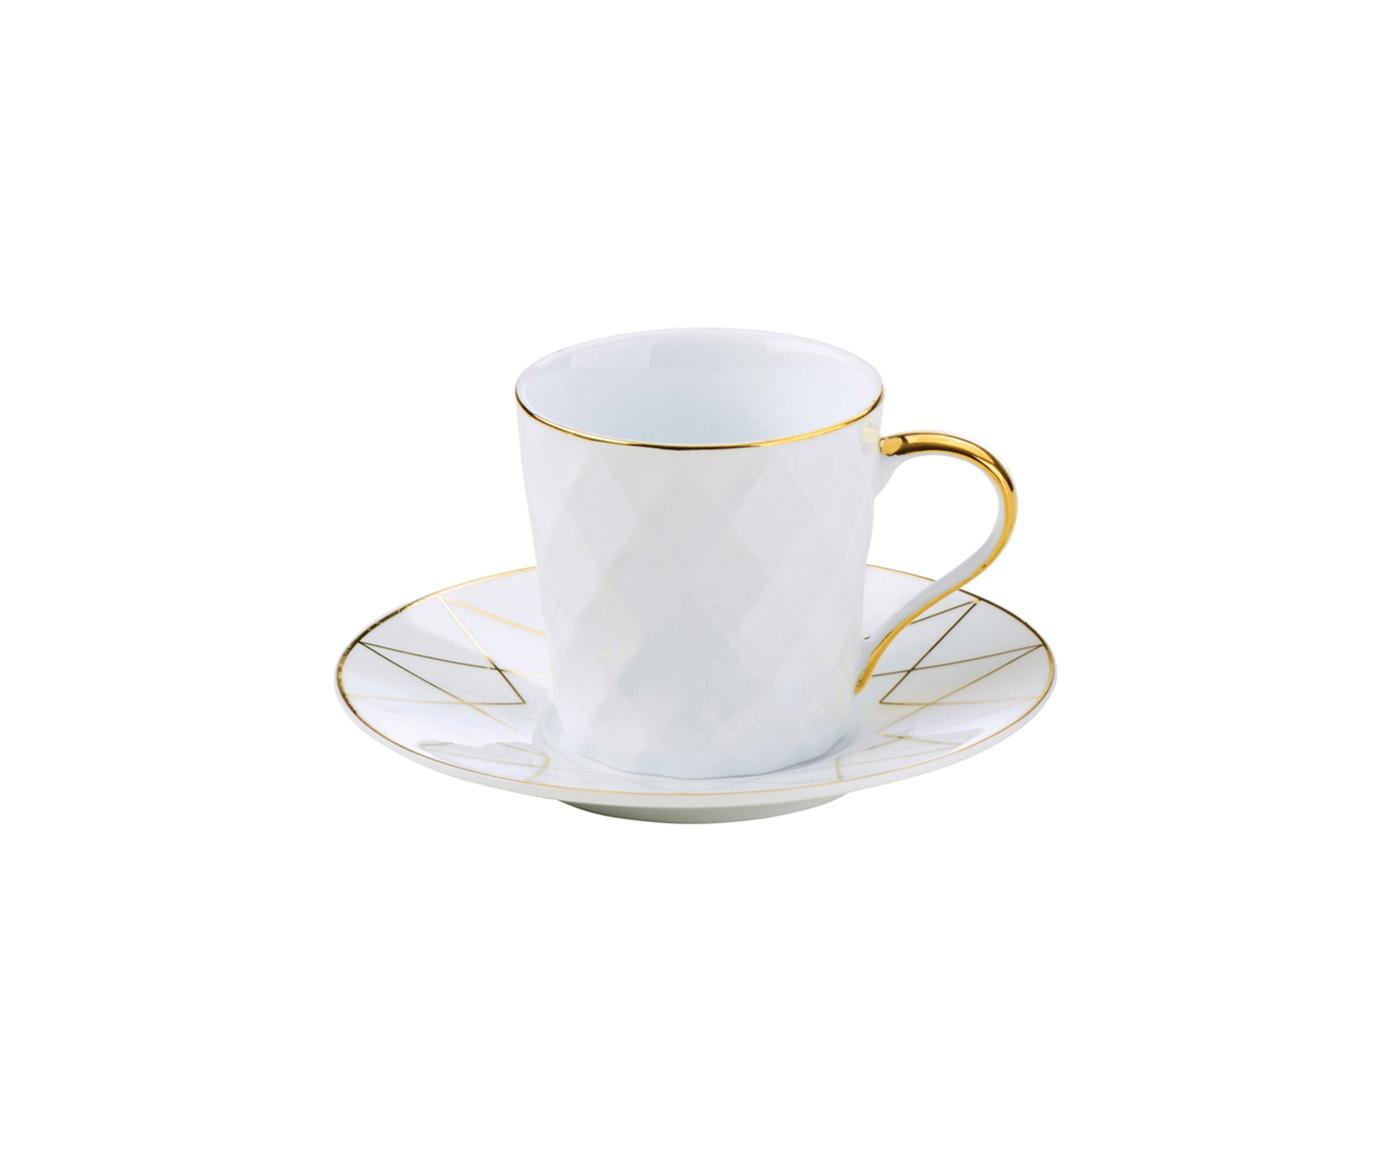 Set 6 tazzine da caffè Lux, Porcellana, Bianco, dorato, Ø 12 x Alt. 6 cm